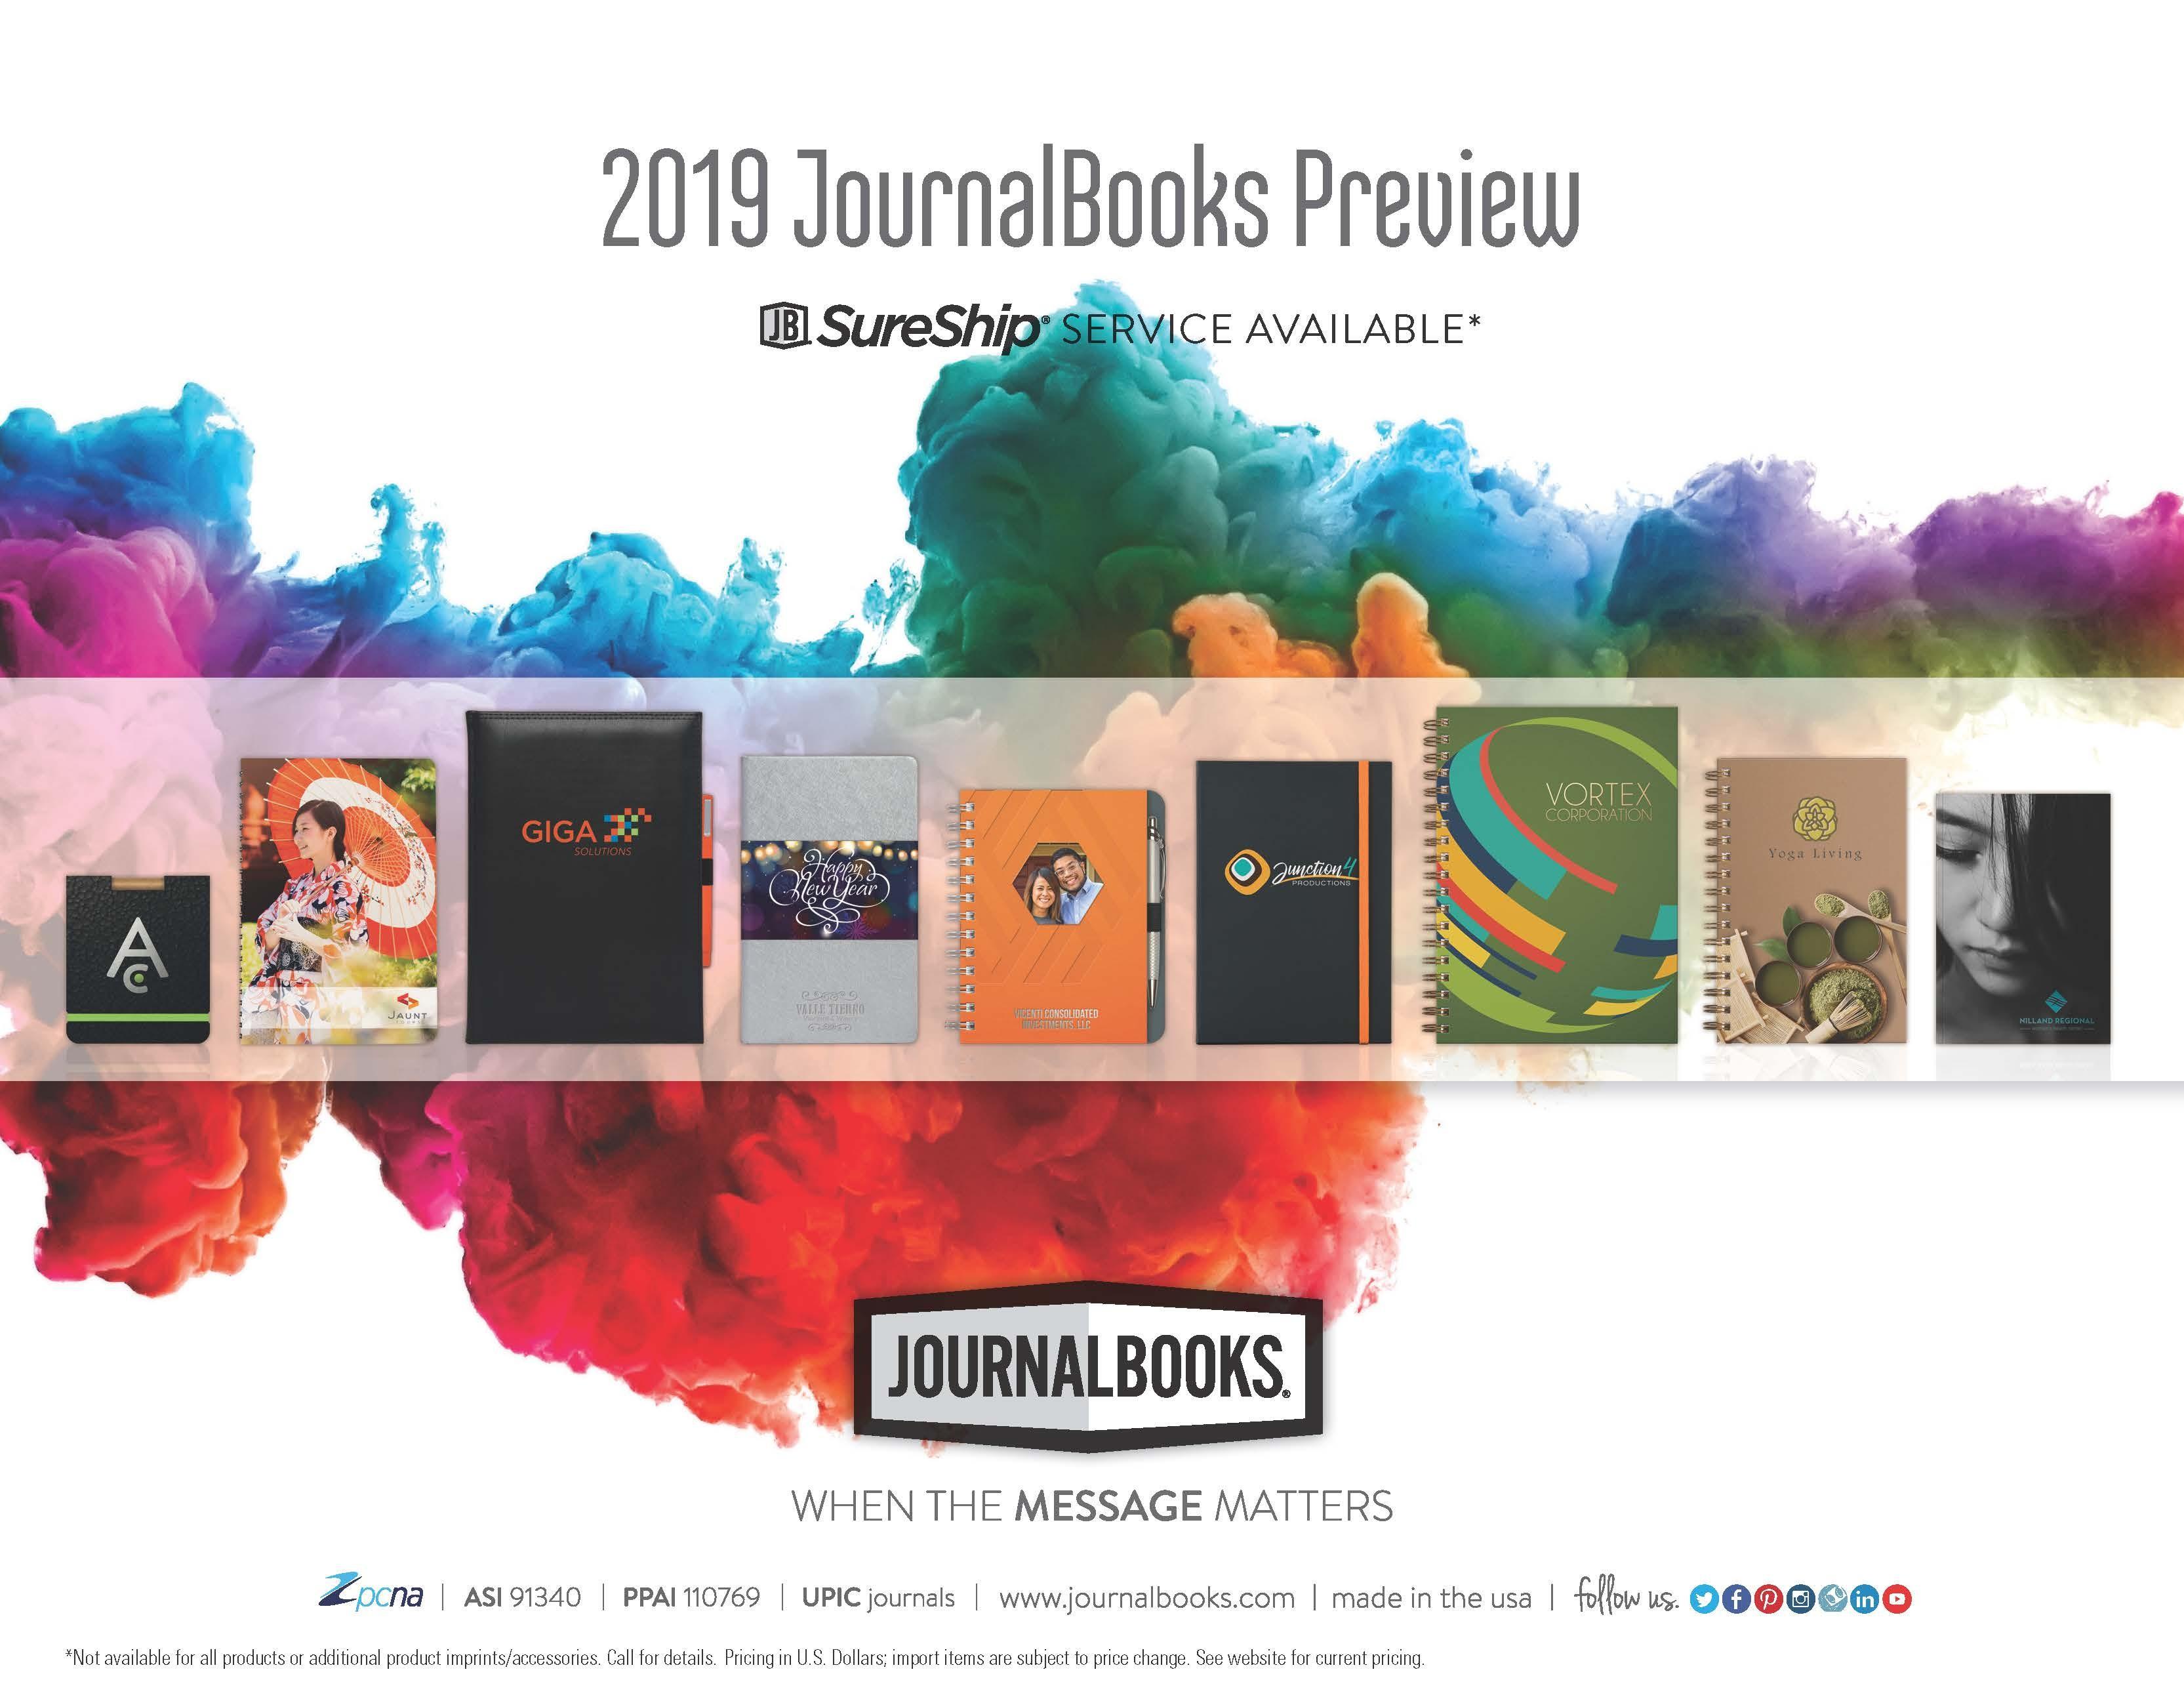 JournalBooks (Preview) 2019-2020